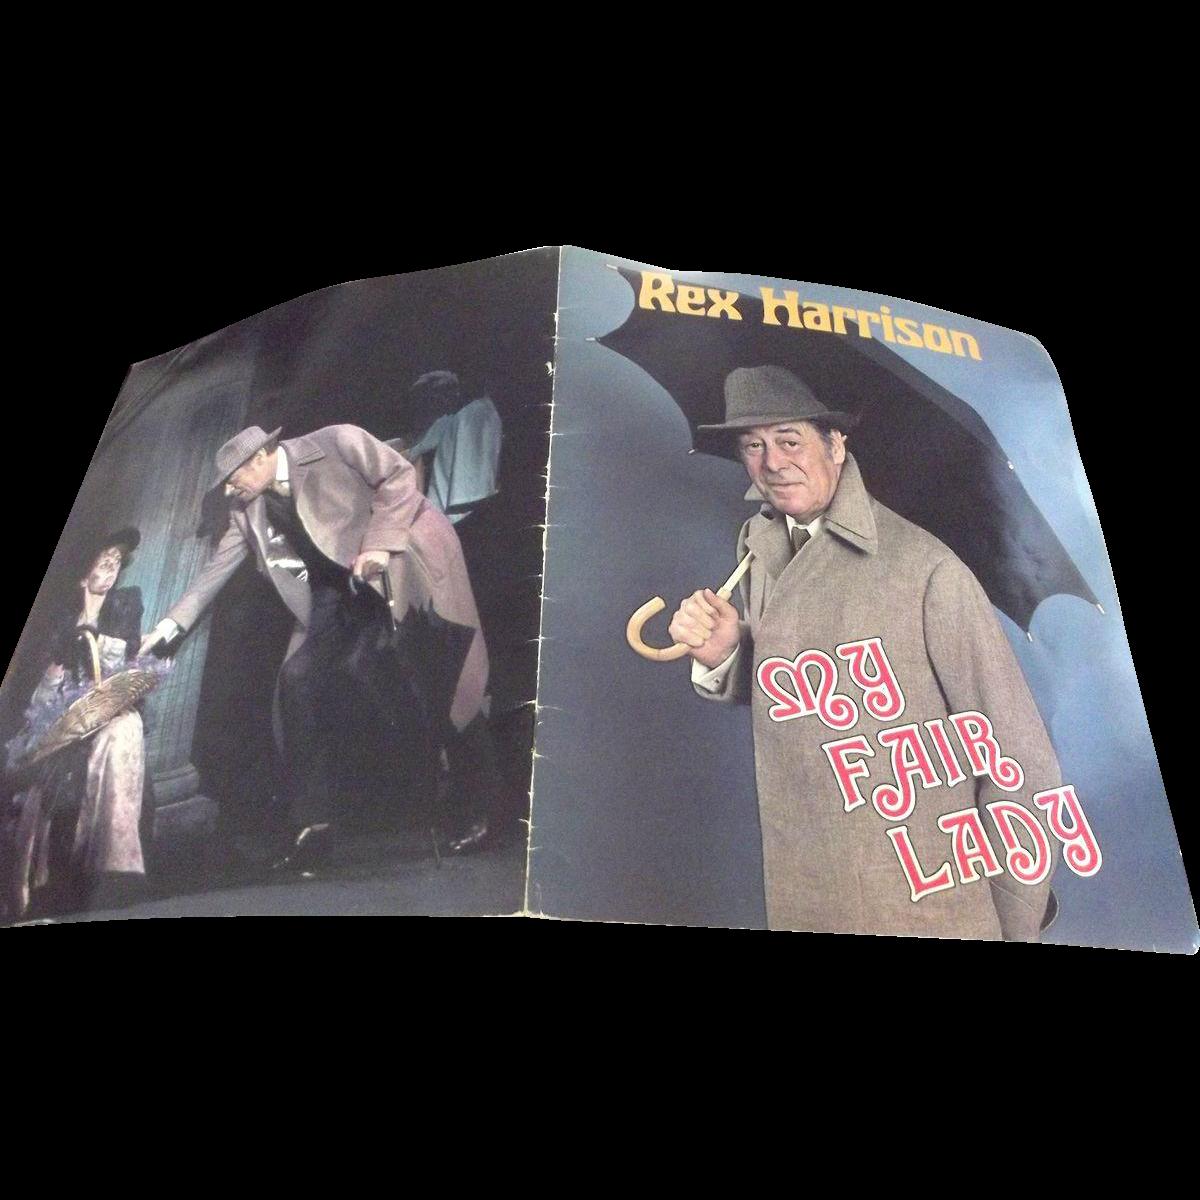 Broadway Program of My Fair Lady Revival in 1981